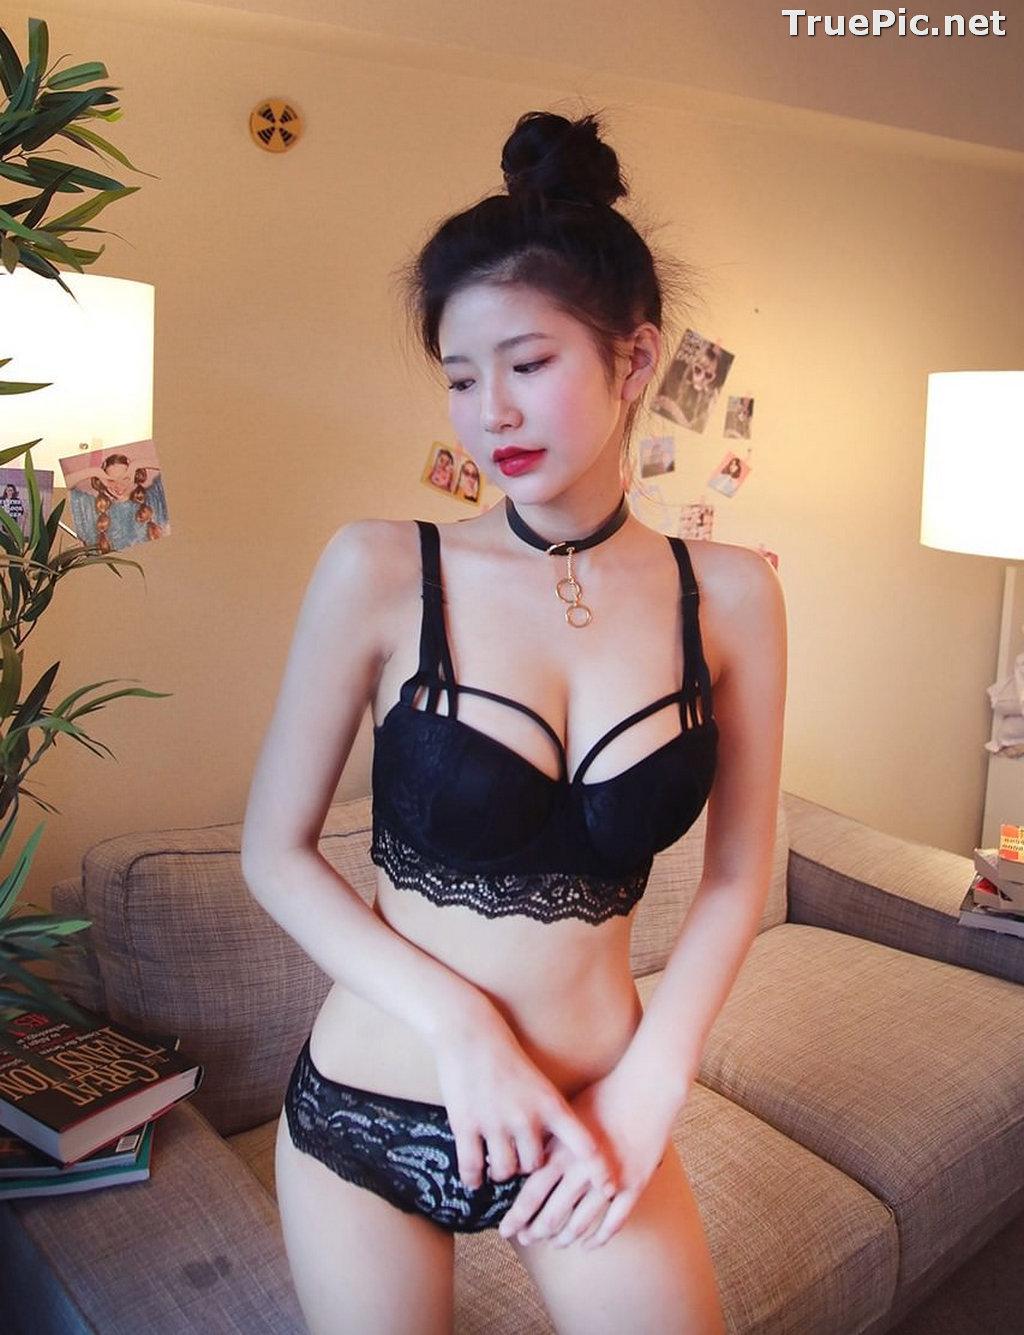 Image Korean Fashion Model - Asaki - Black and White Lingerie Set - TruePic.net - Picture-8